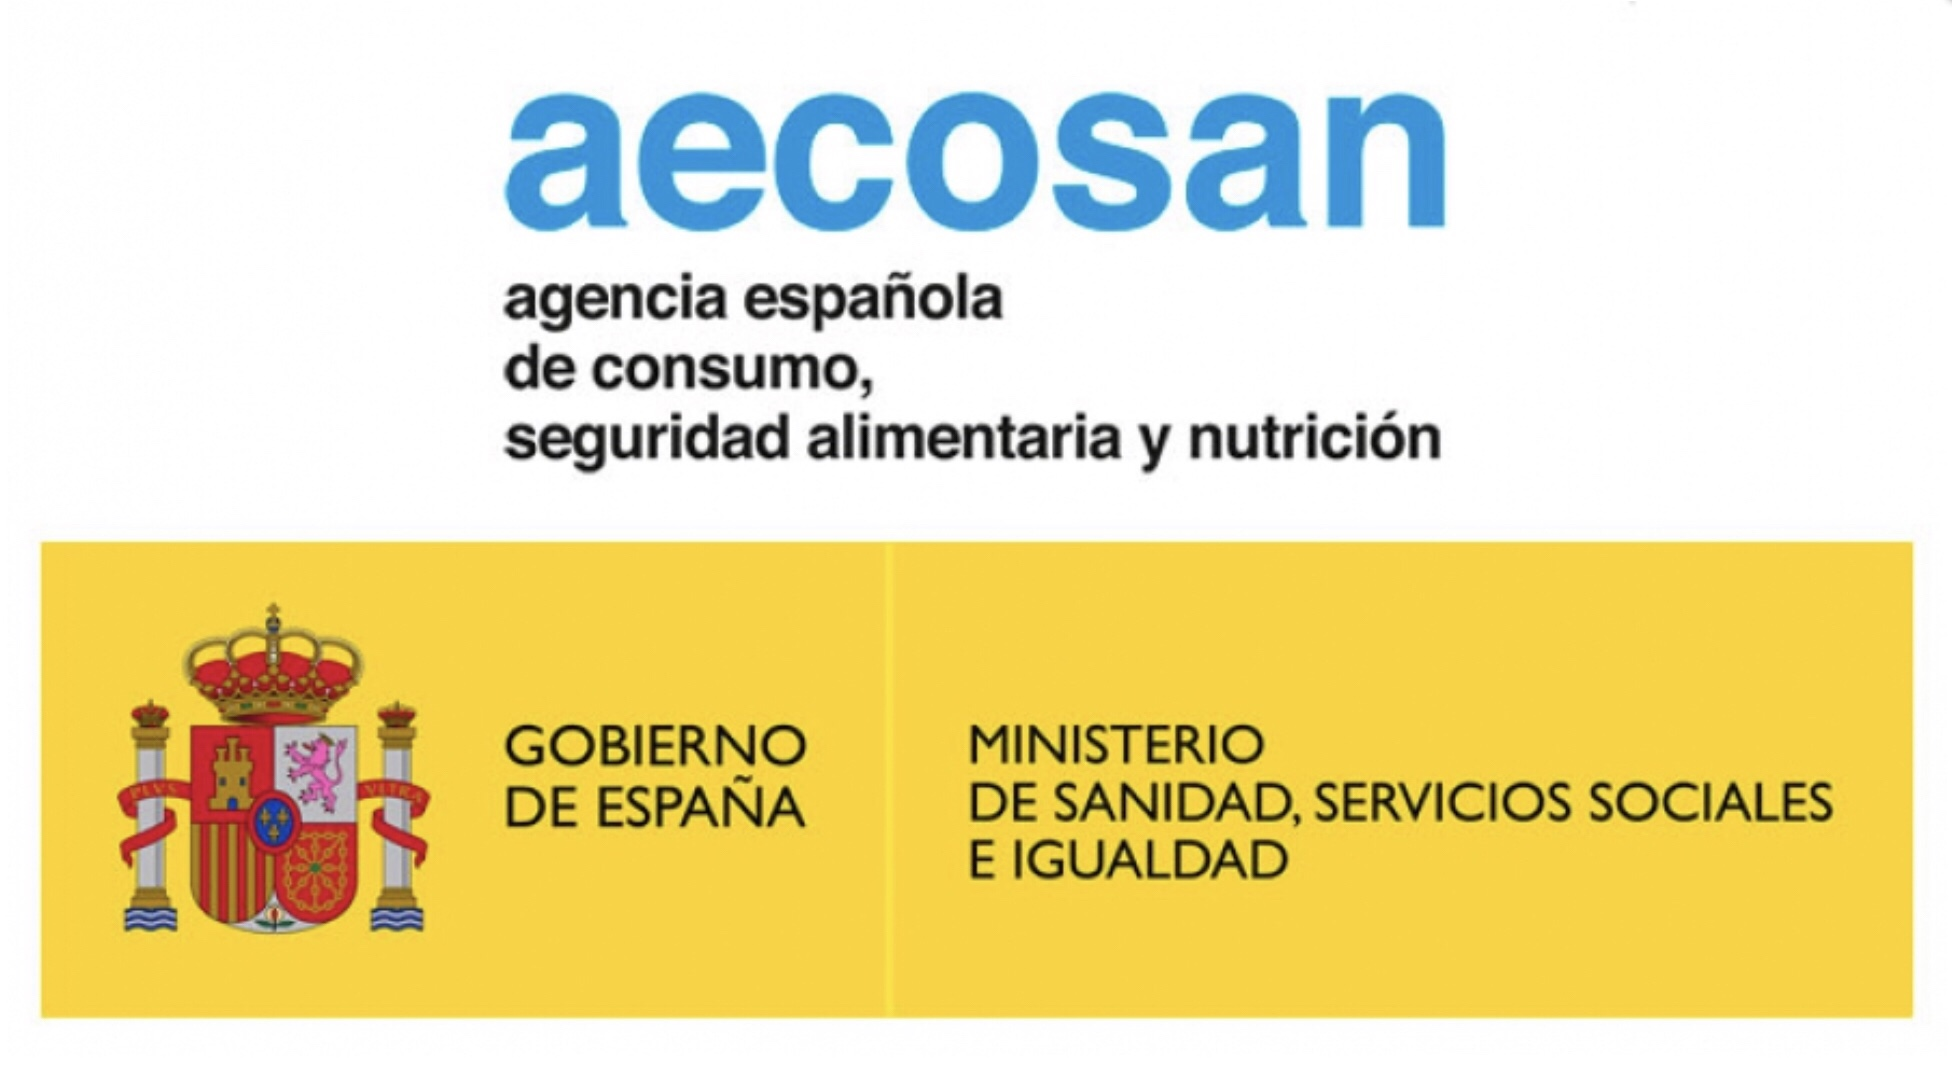 Maxicredit Aecosan. Sello Oficial Intermediacion financiera malaga